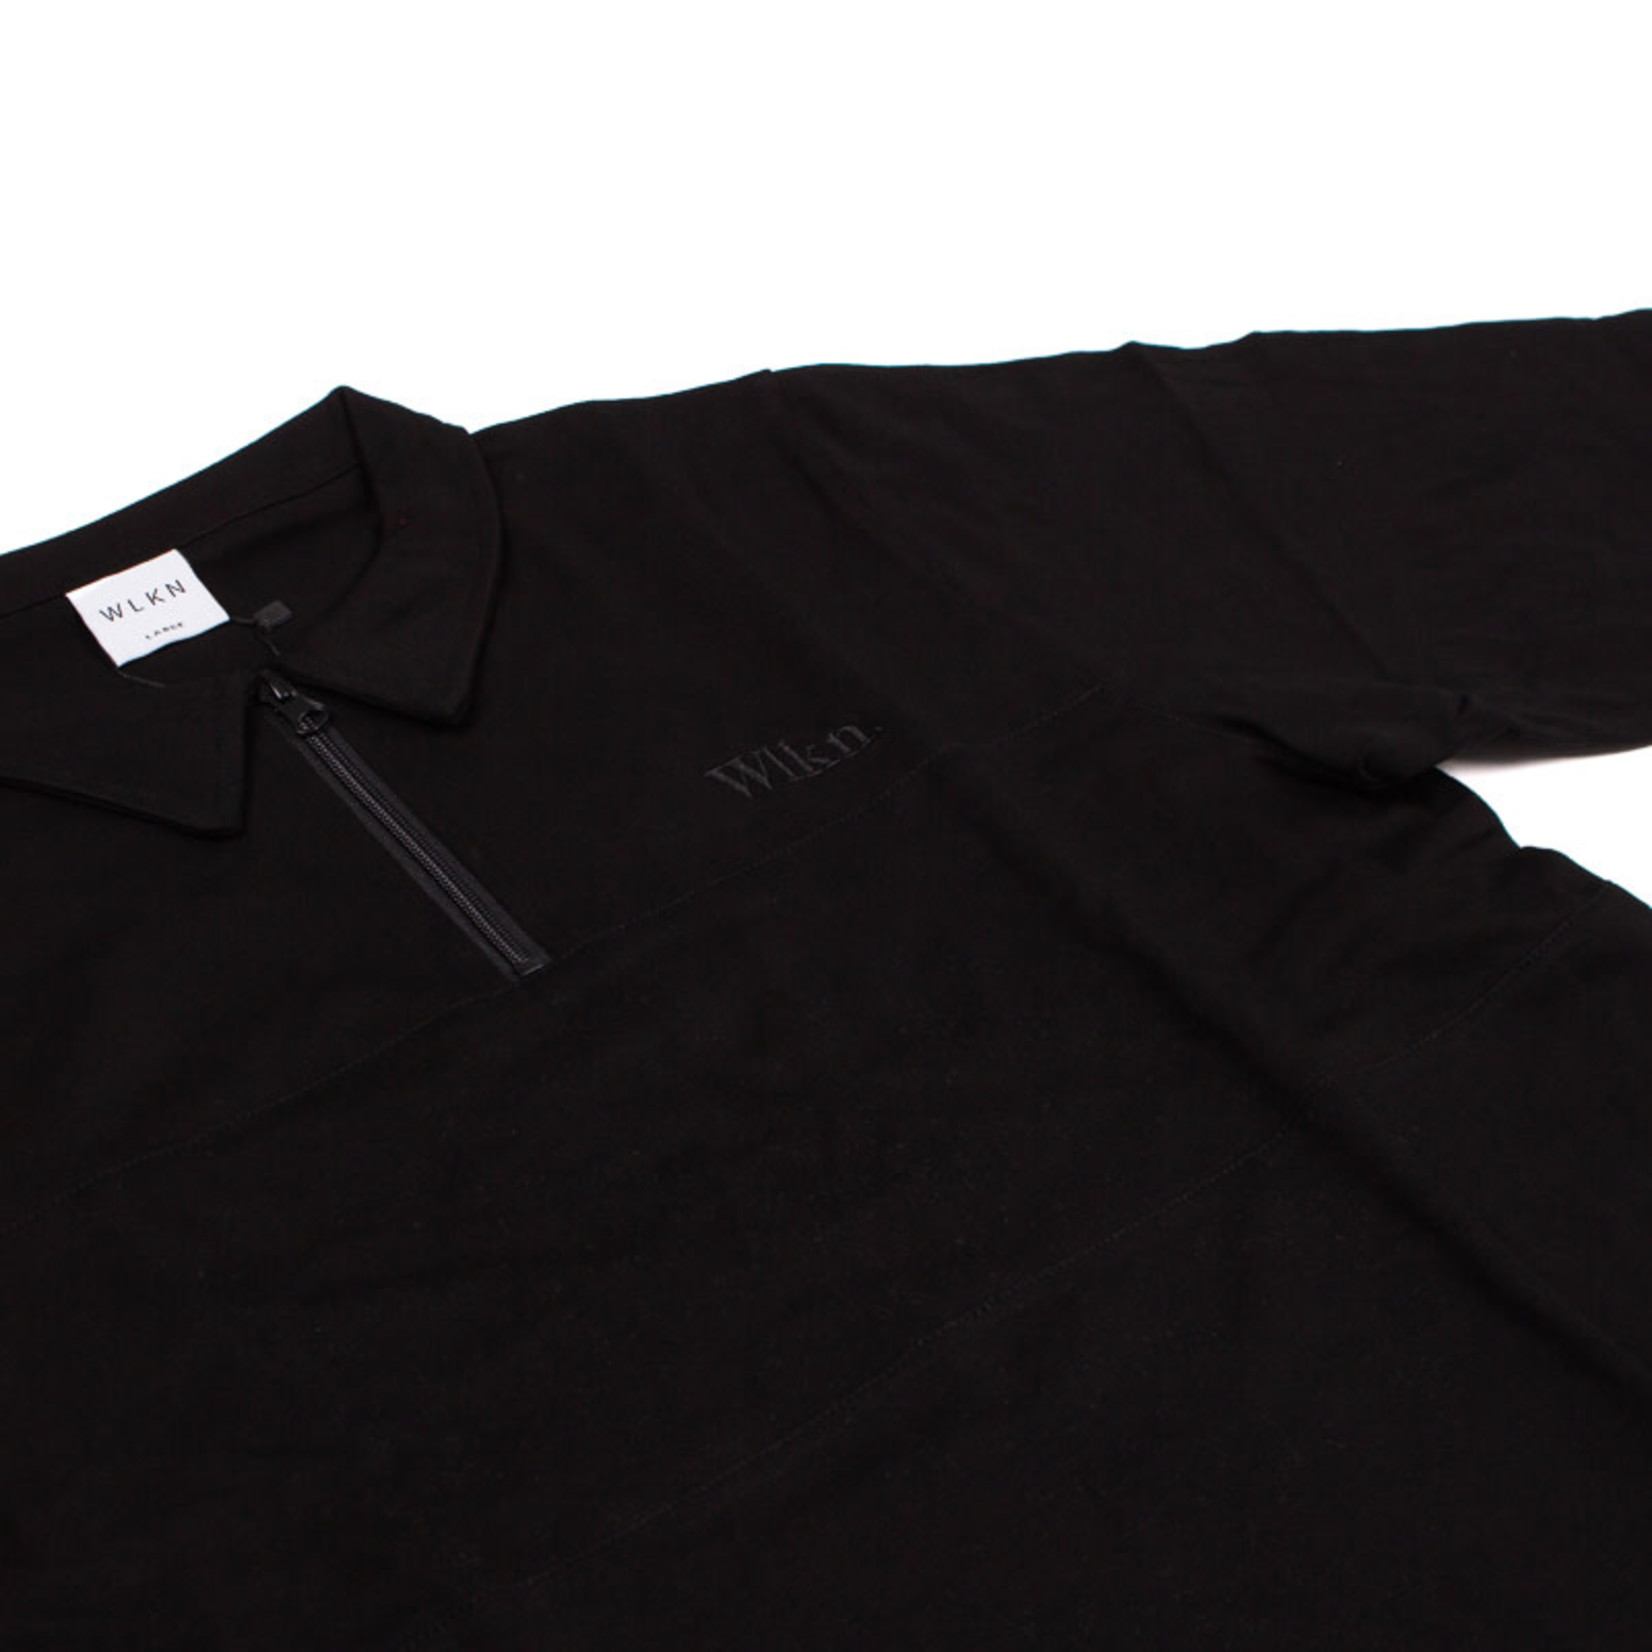 WLKN WLKN : Vintage Long Sleeves Polo